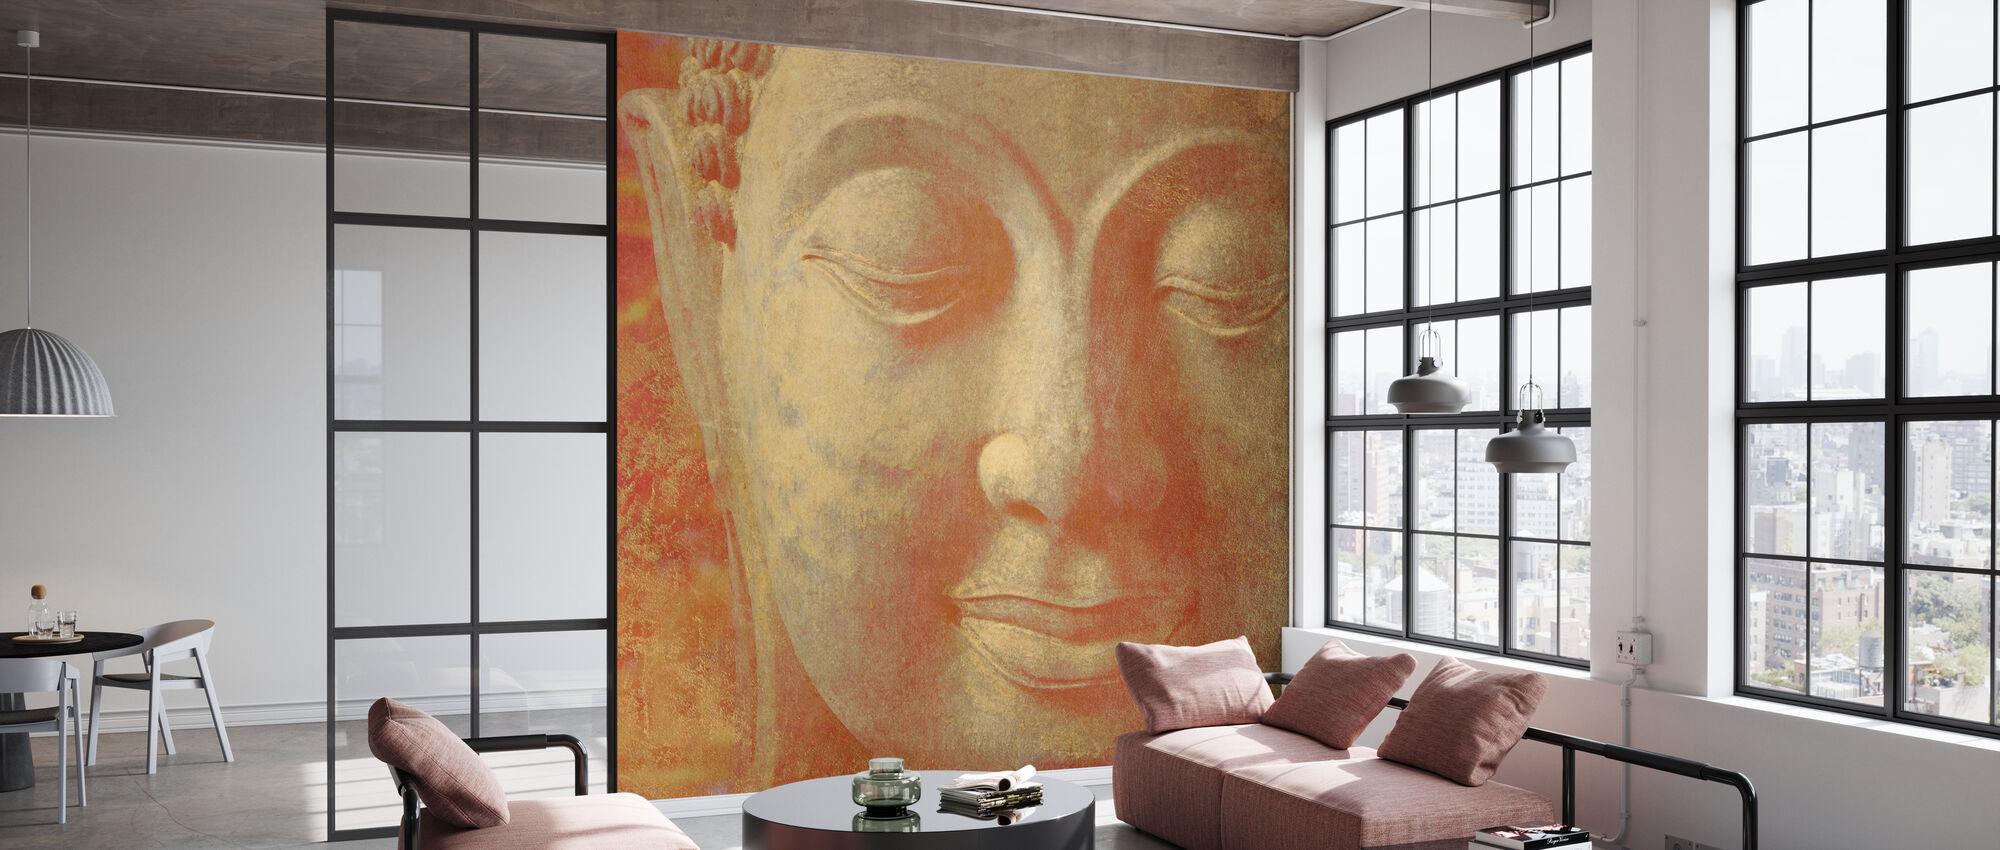 Safran Buddha kvadreret - Tapet - Kontor